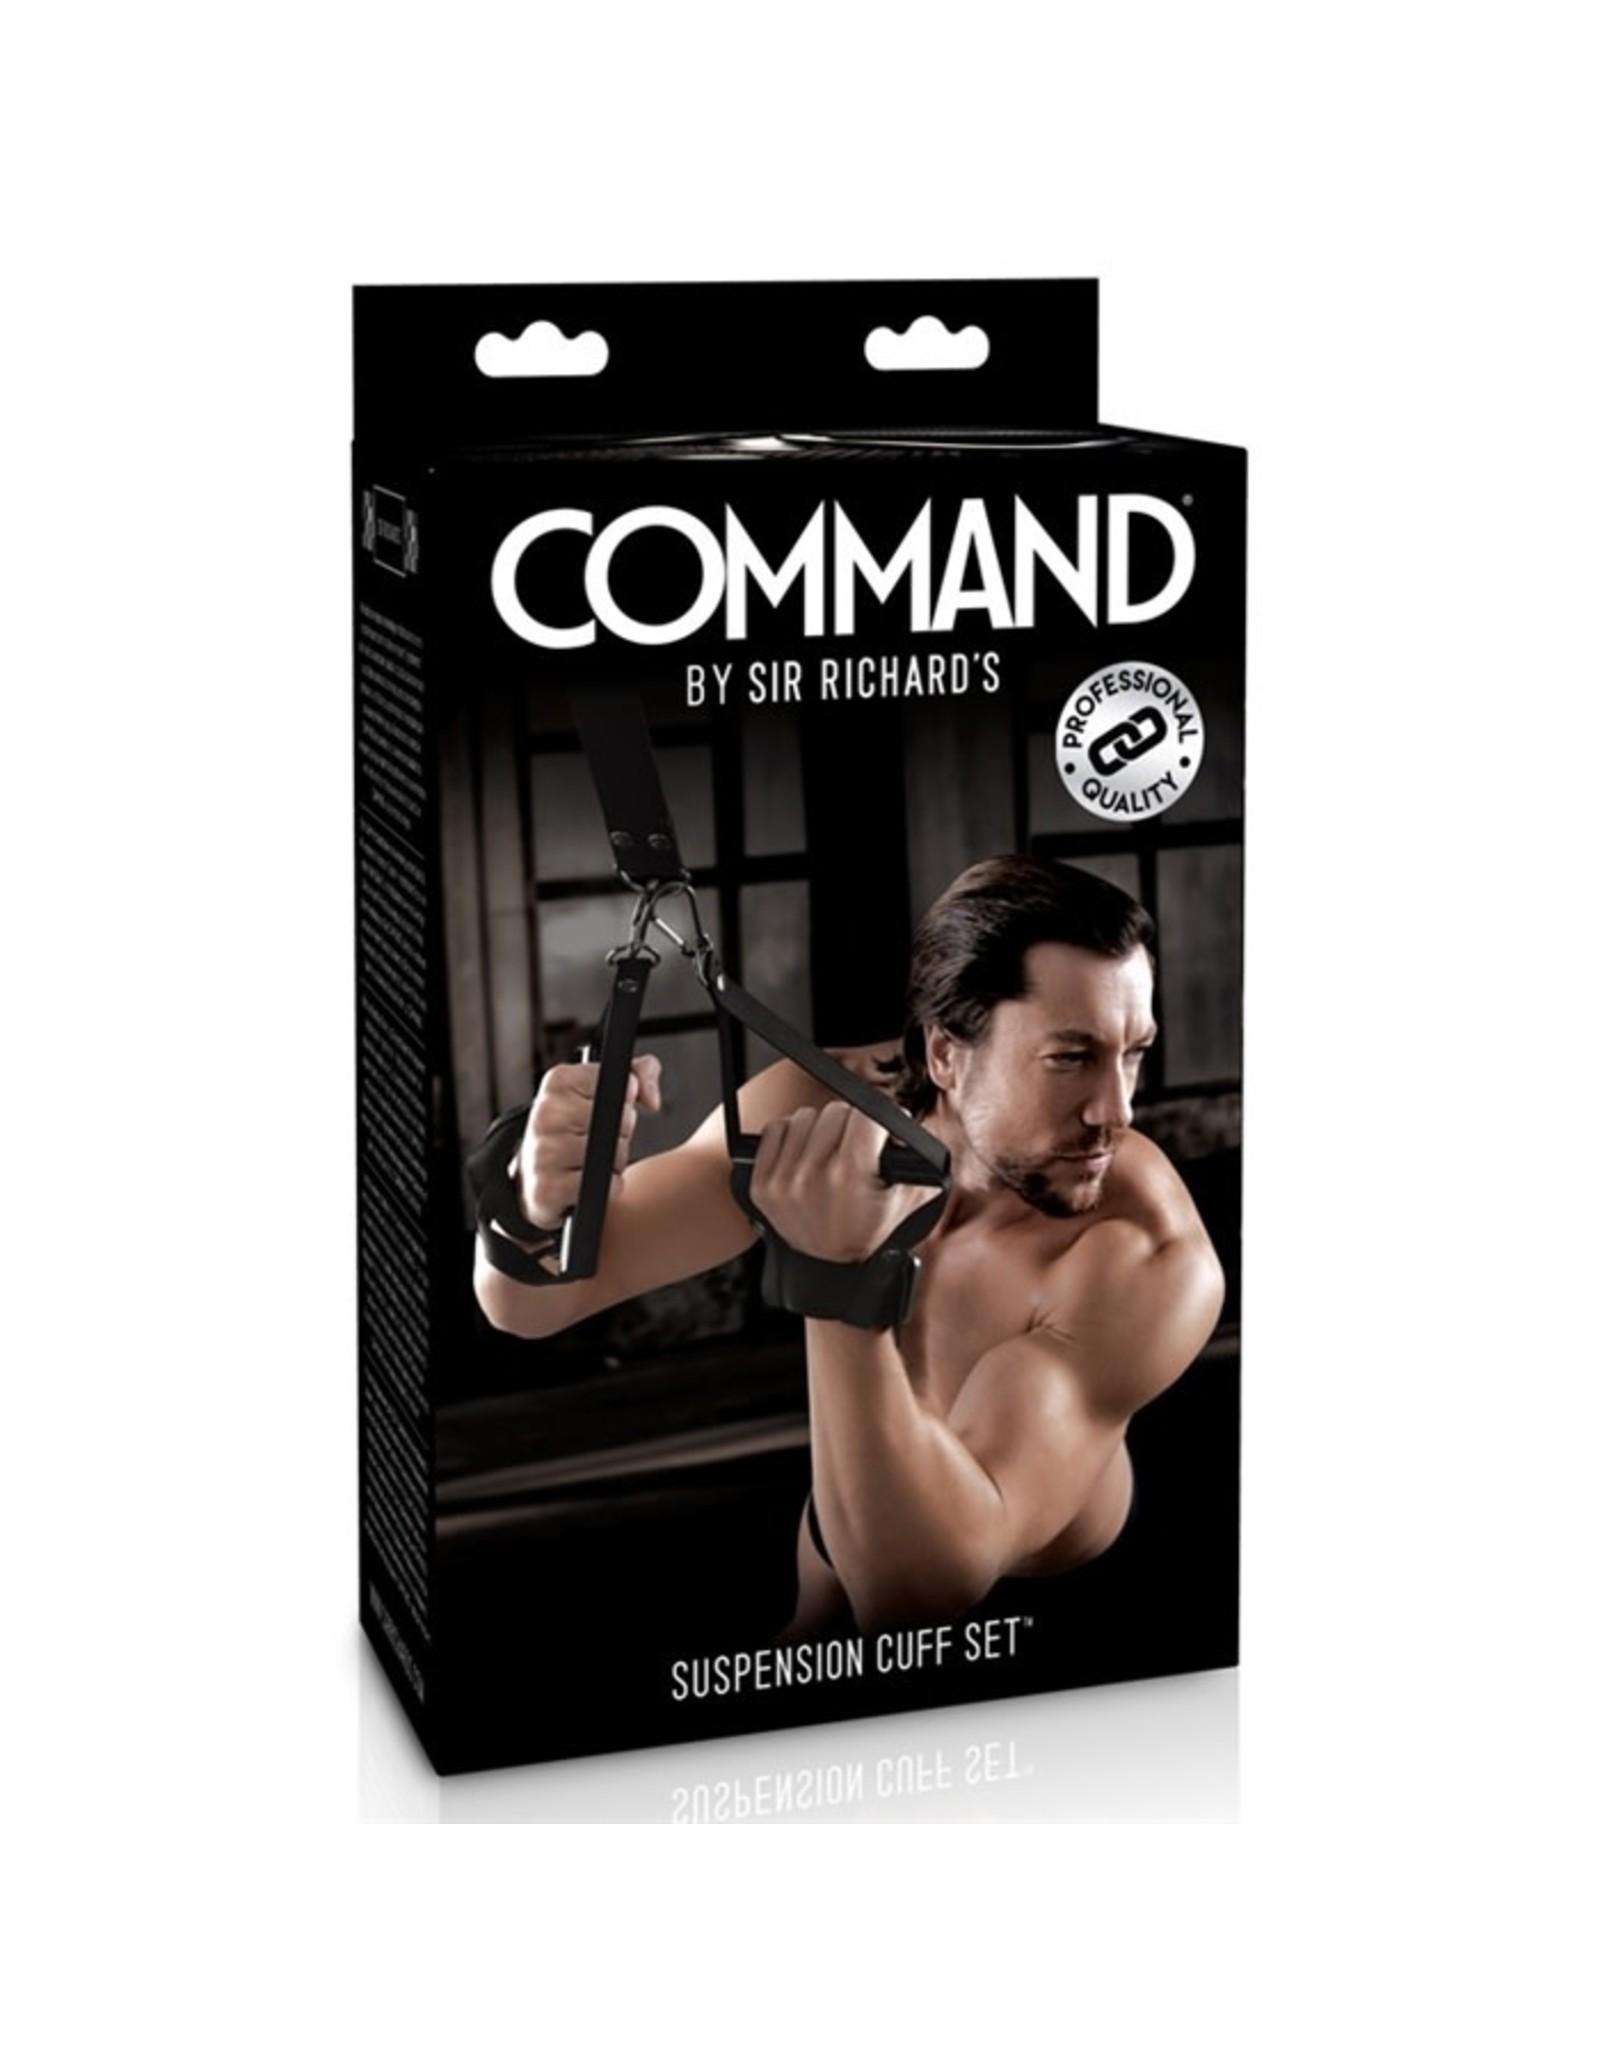 Sir Richard's Command - Suspension Cuff Set